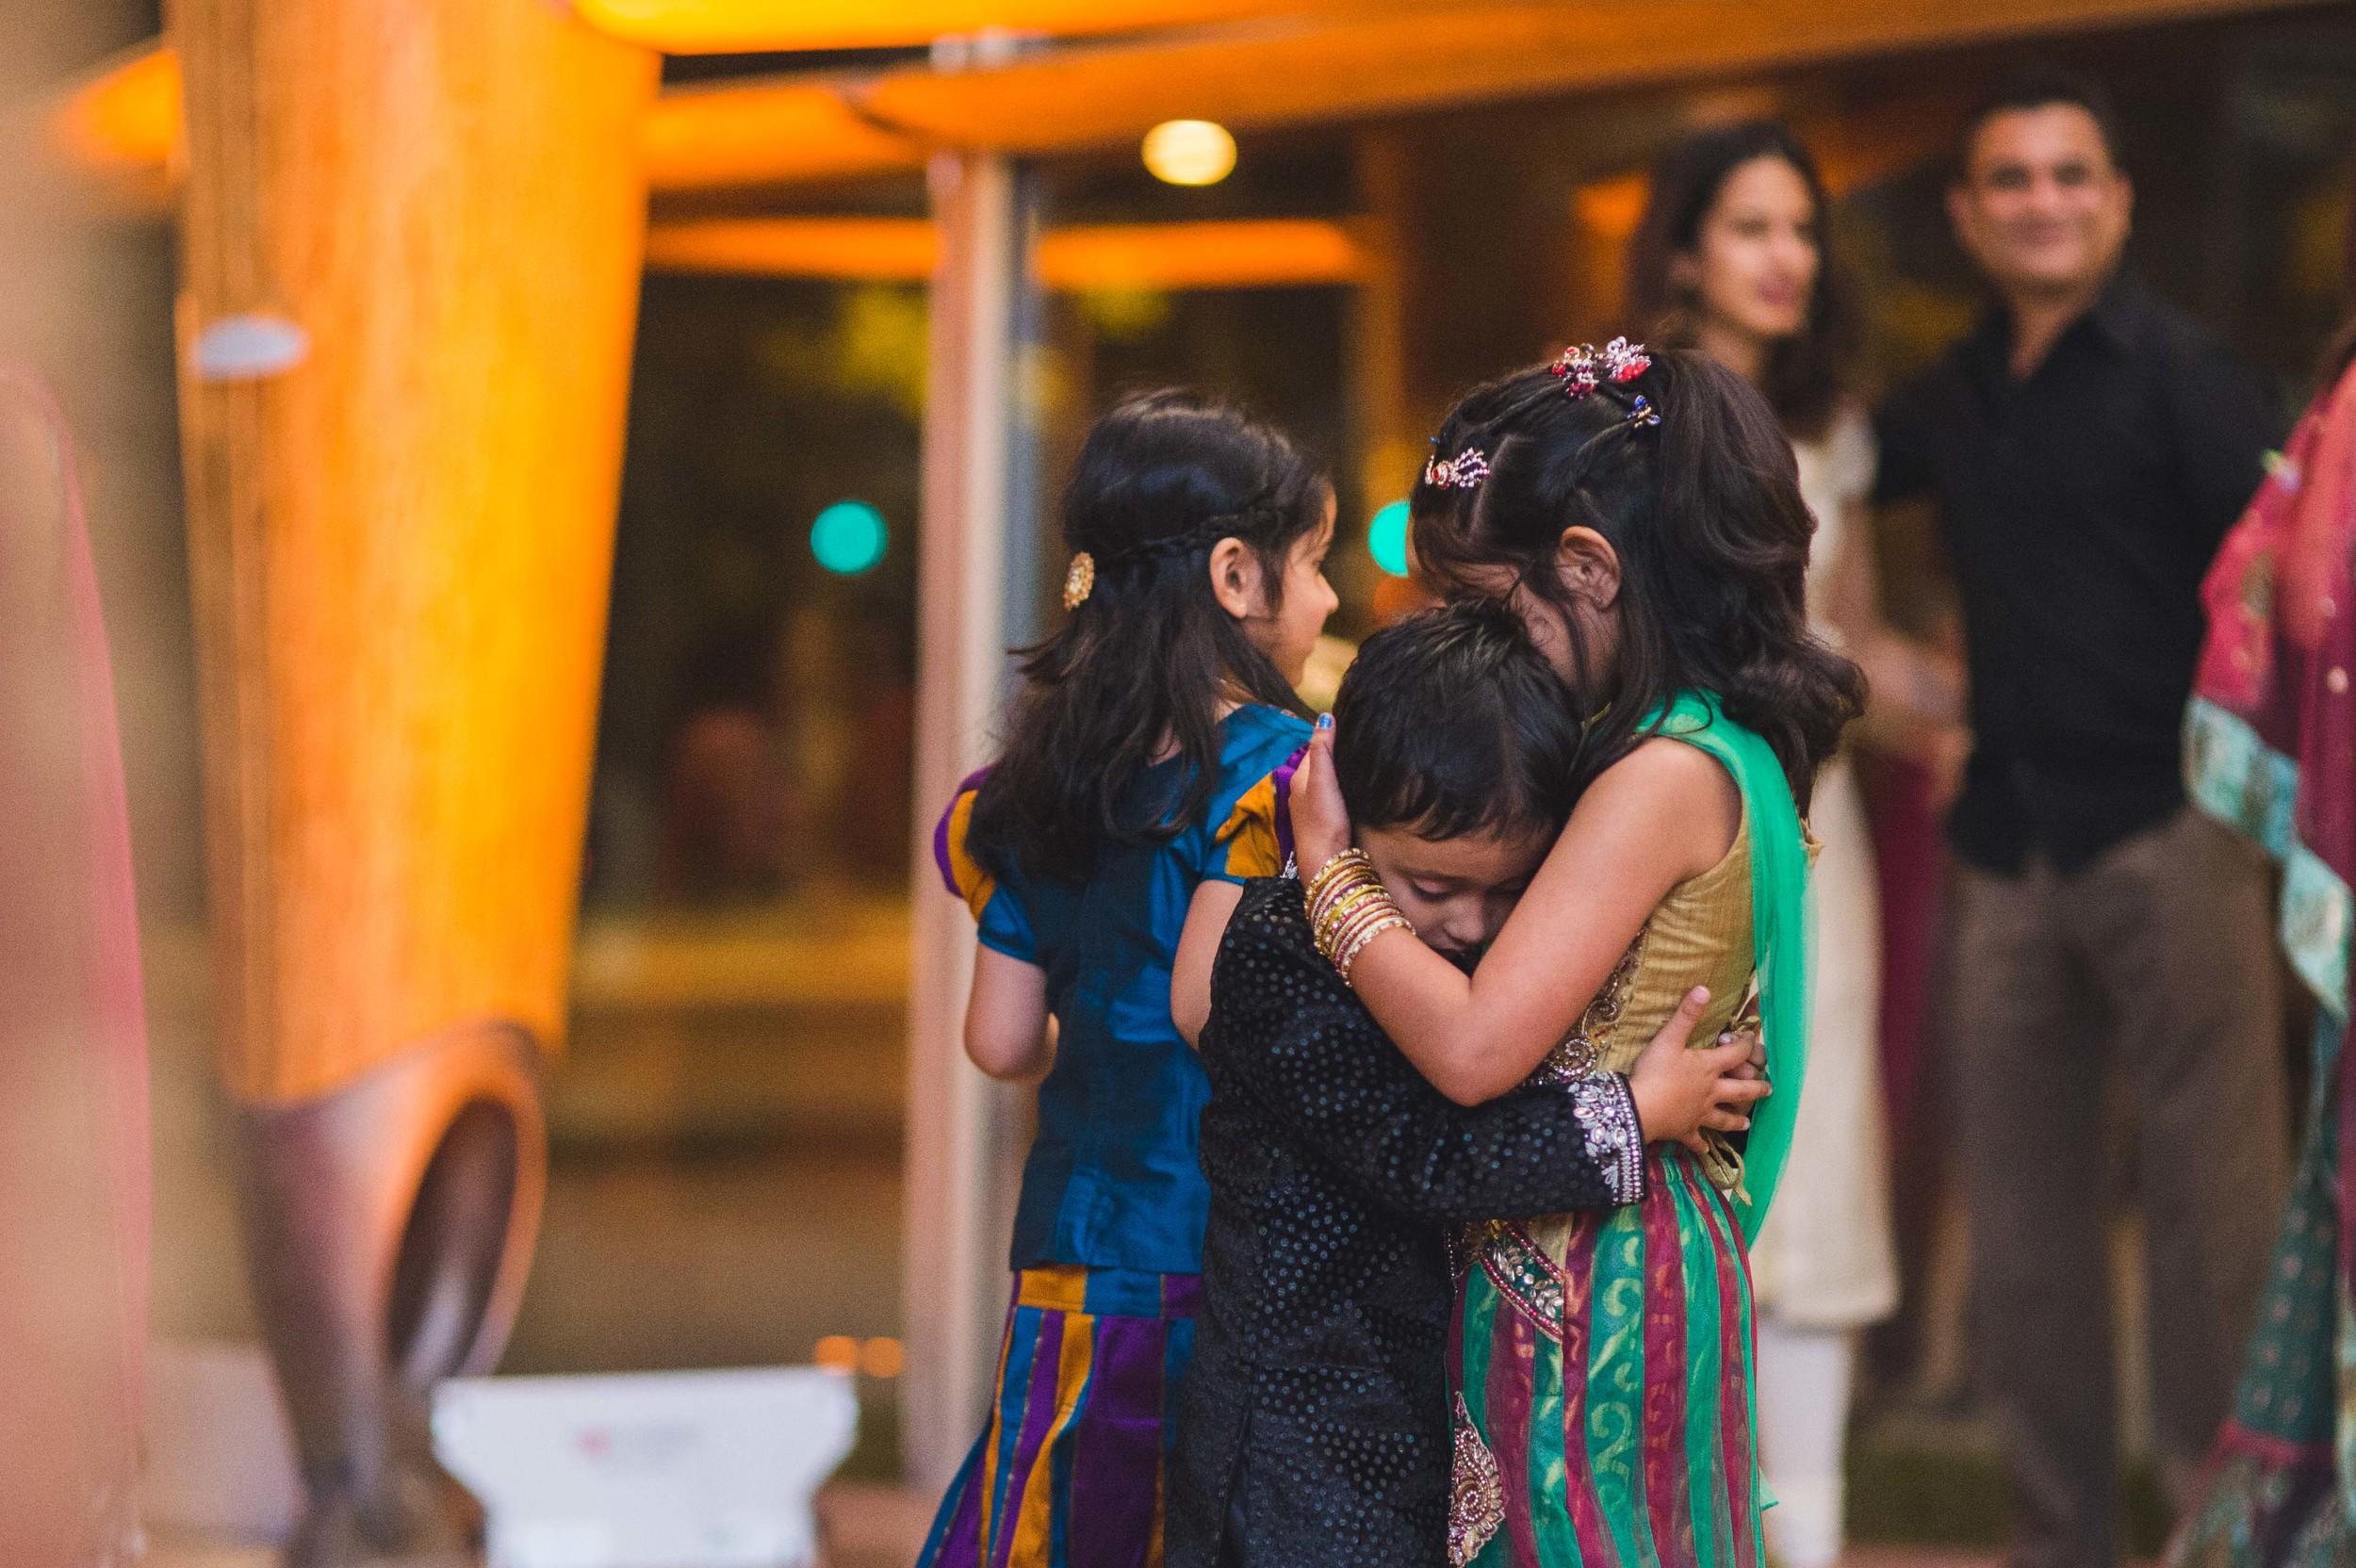 Indian Pre-wedding  at Arena Stage Washington DC by Mantas Kubilinskas-26.jpg